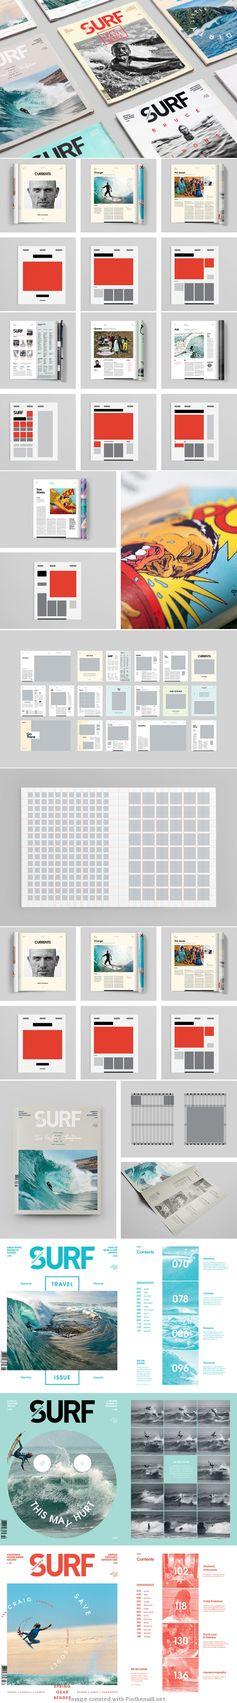 Surf magazine grid layout